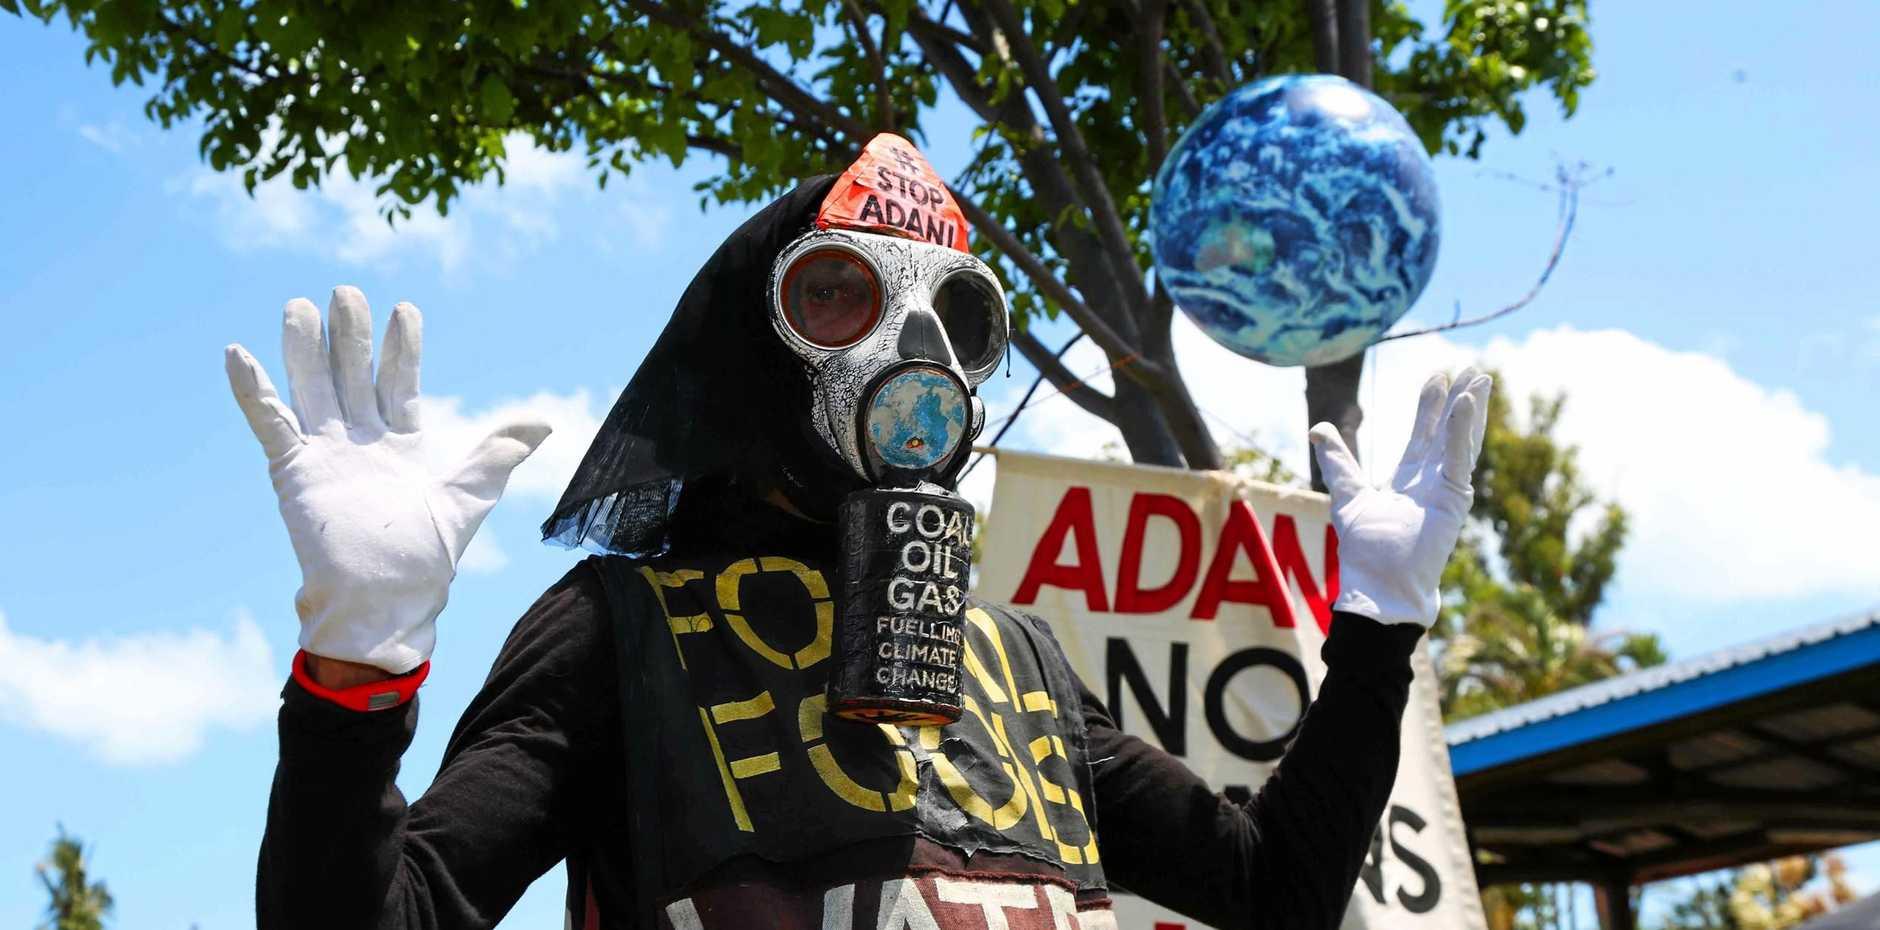 Anti-Adani protestor Benny Zane at the Airlie Beach foreshore markets.